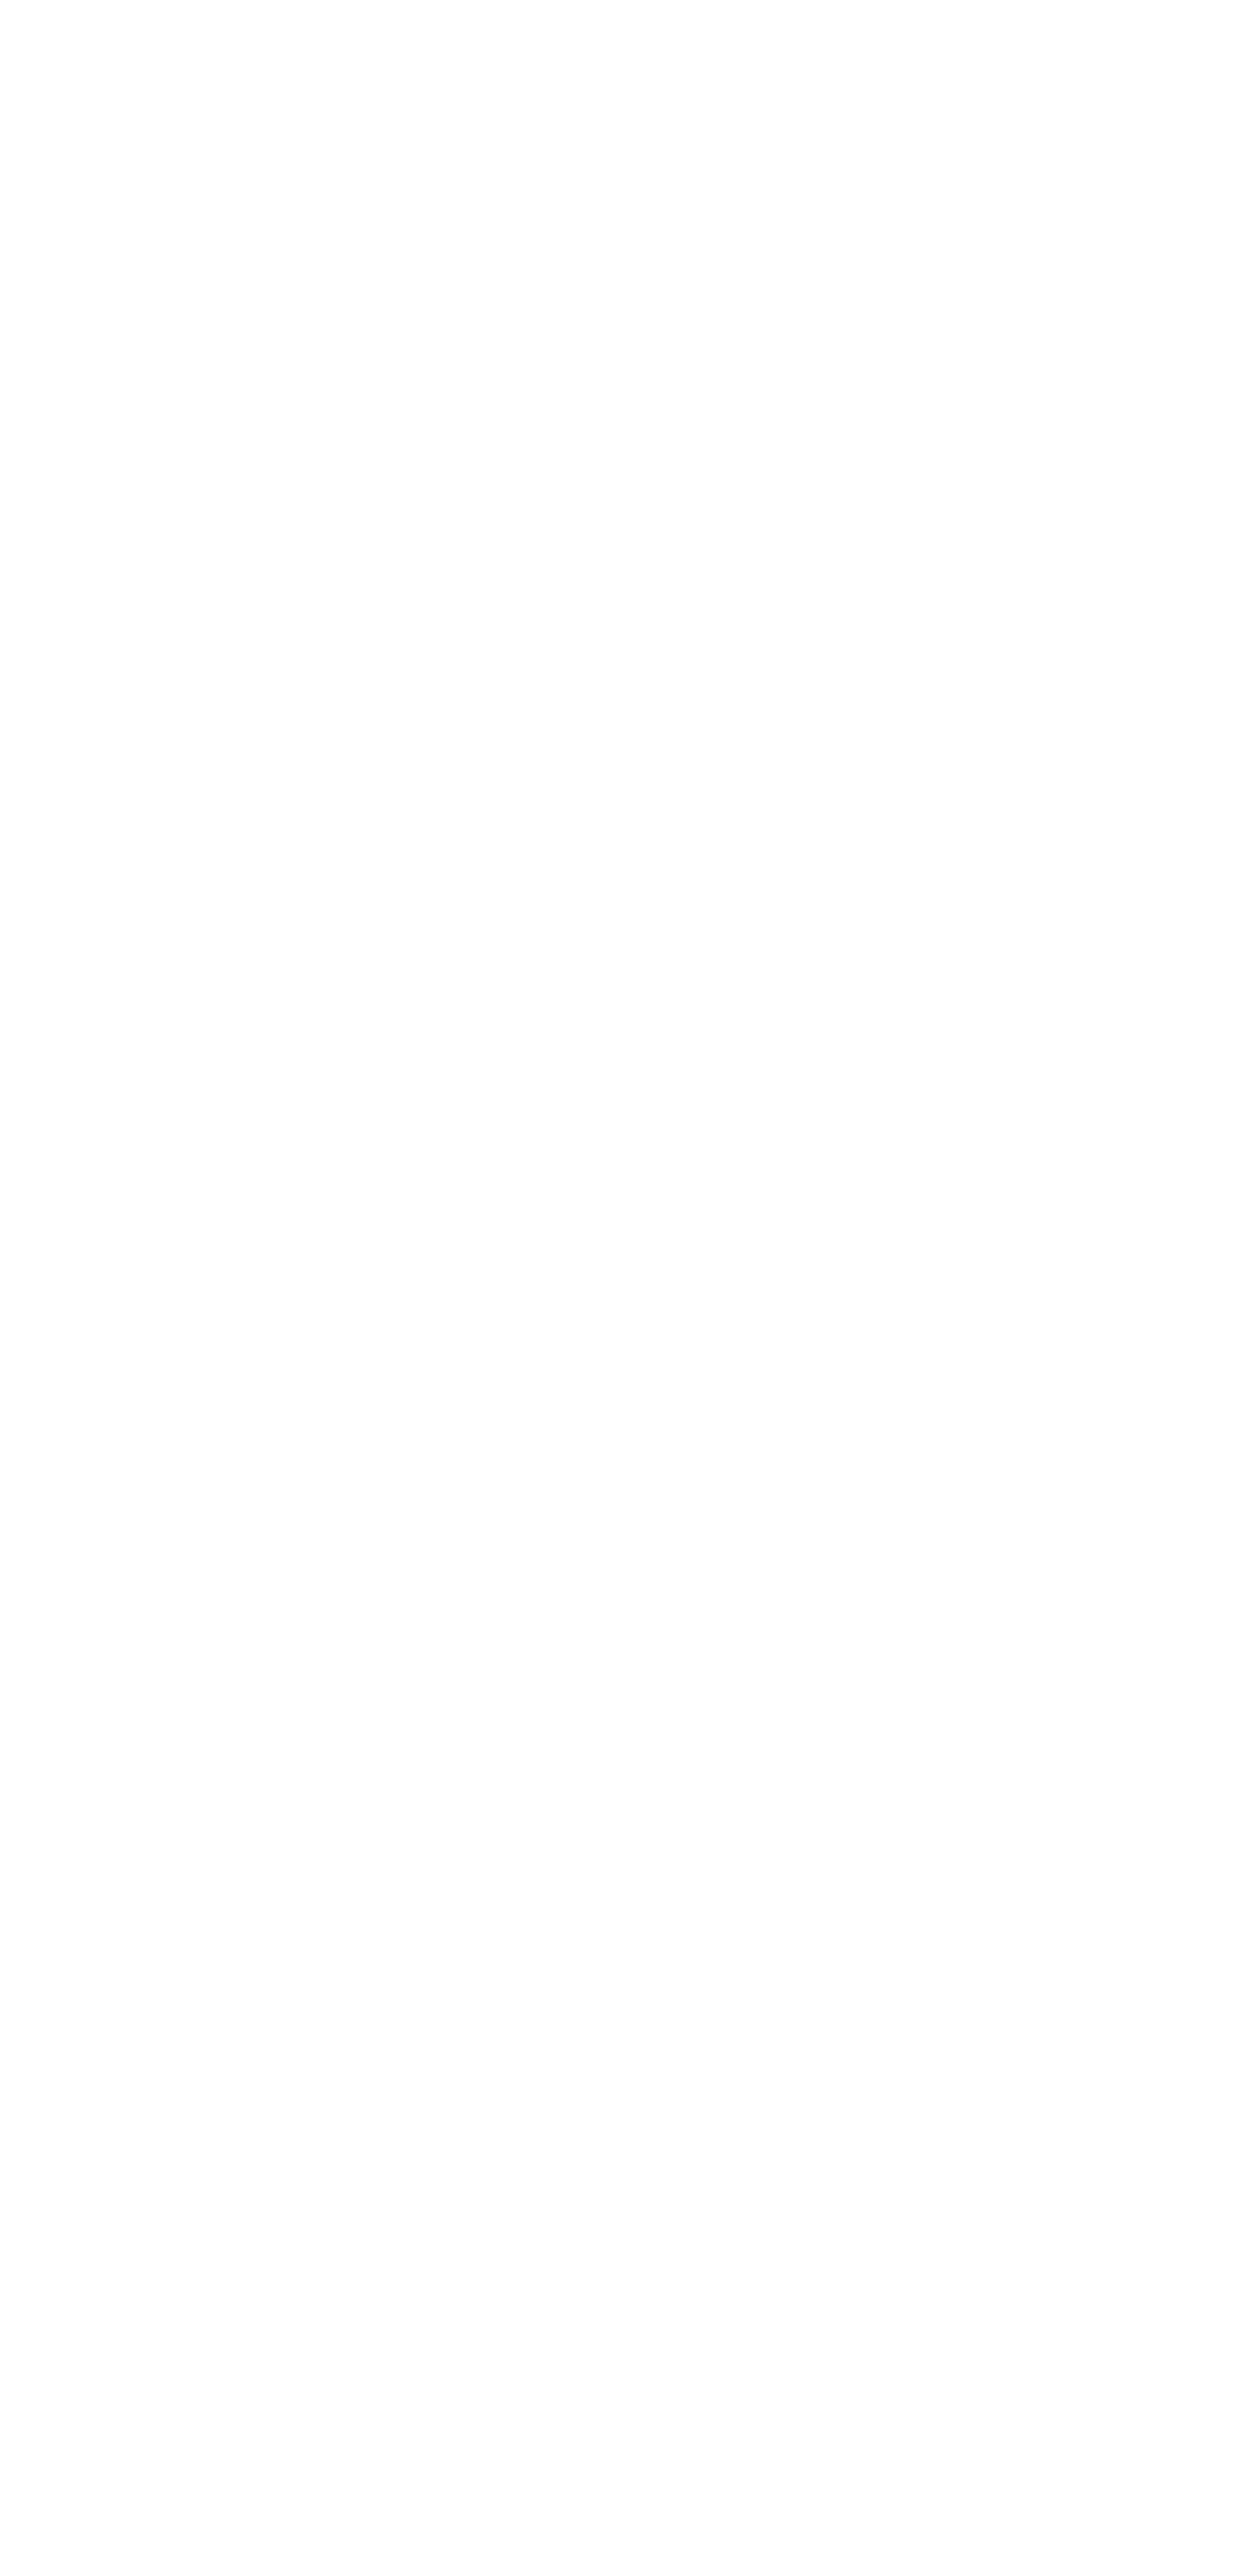 20181031_131401